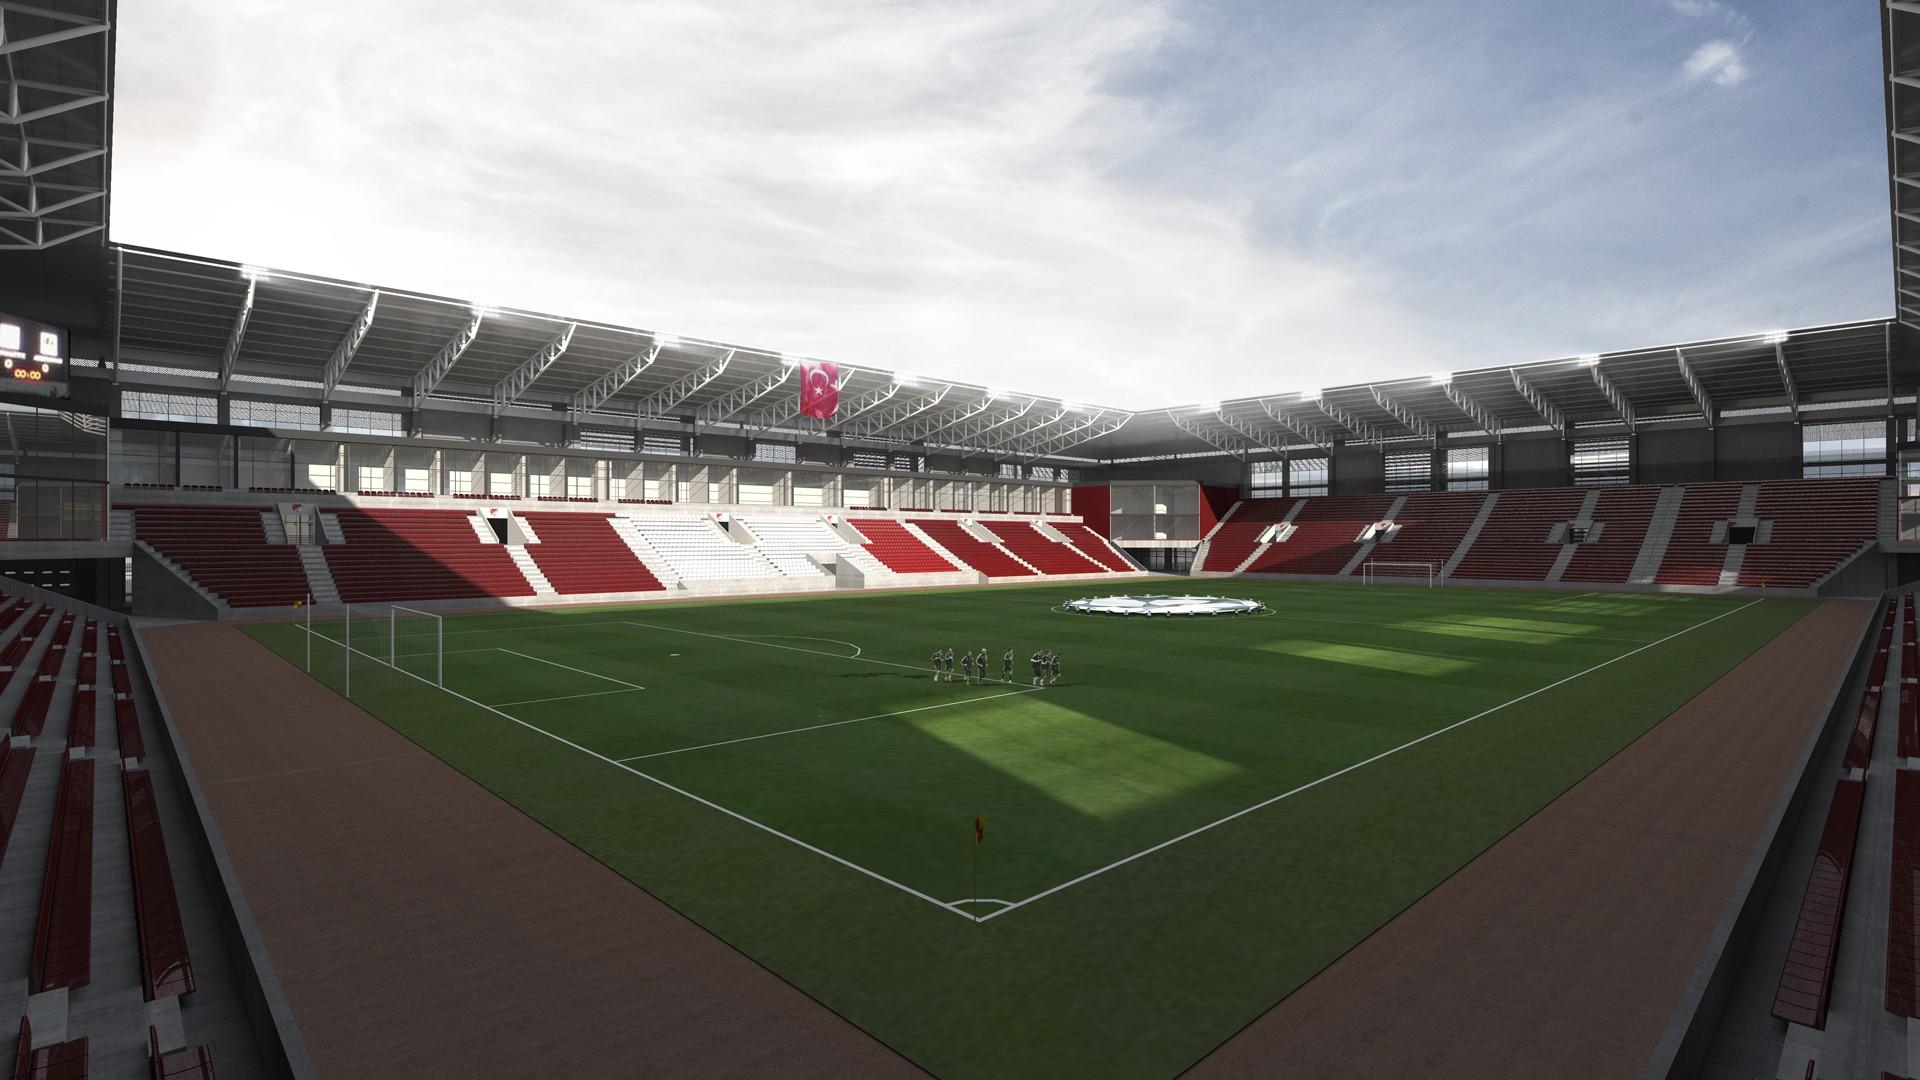 Yeni Elazig Stadyumu